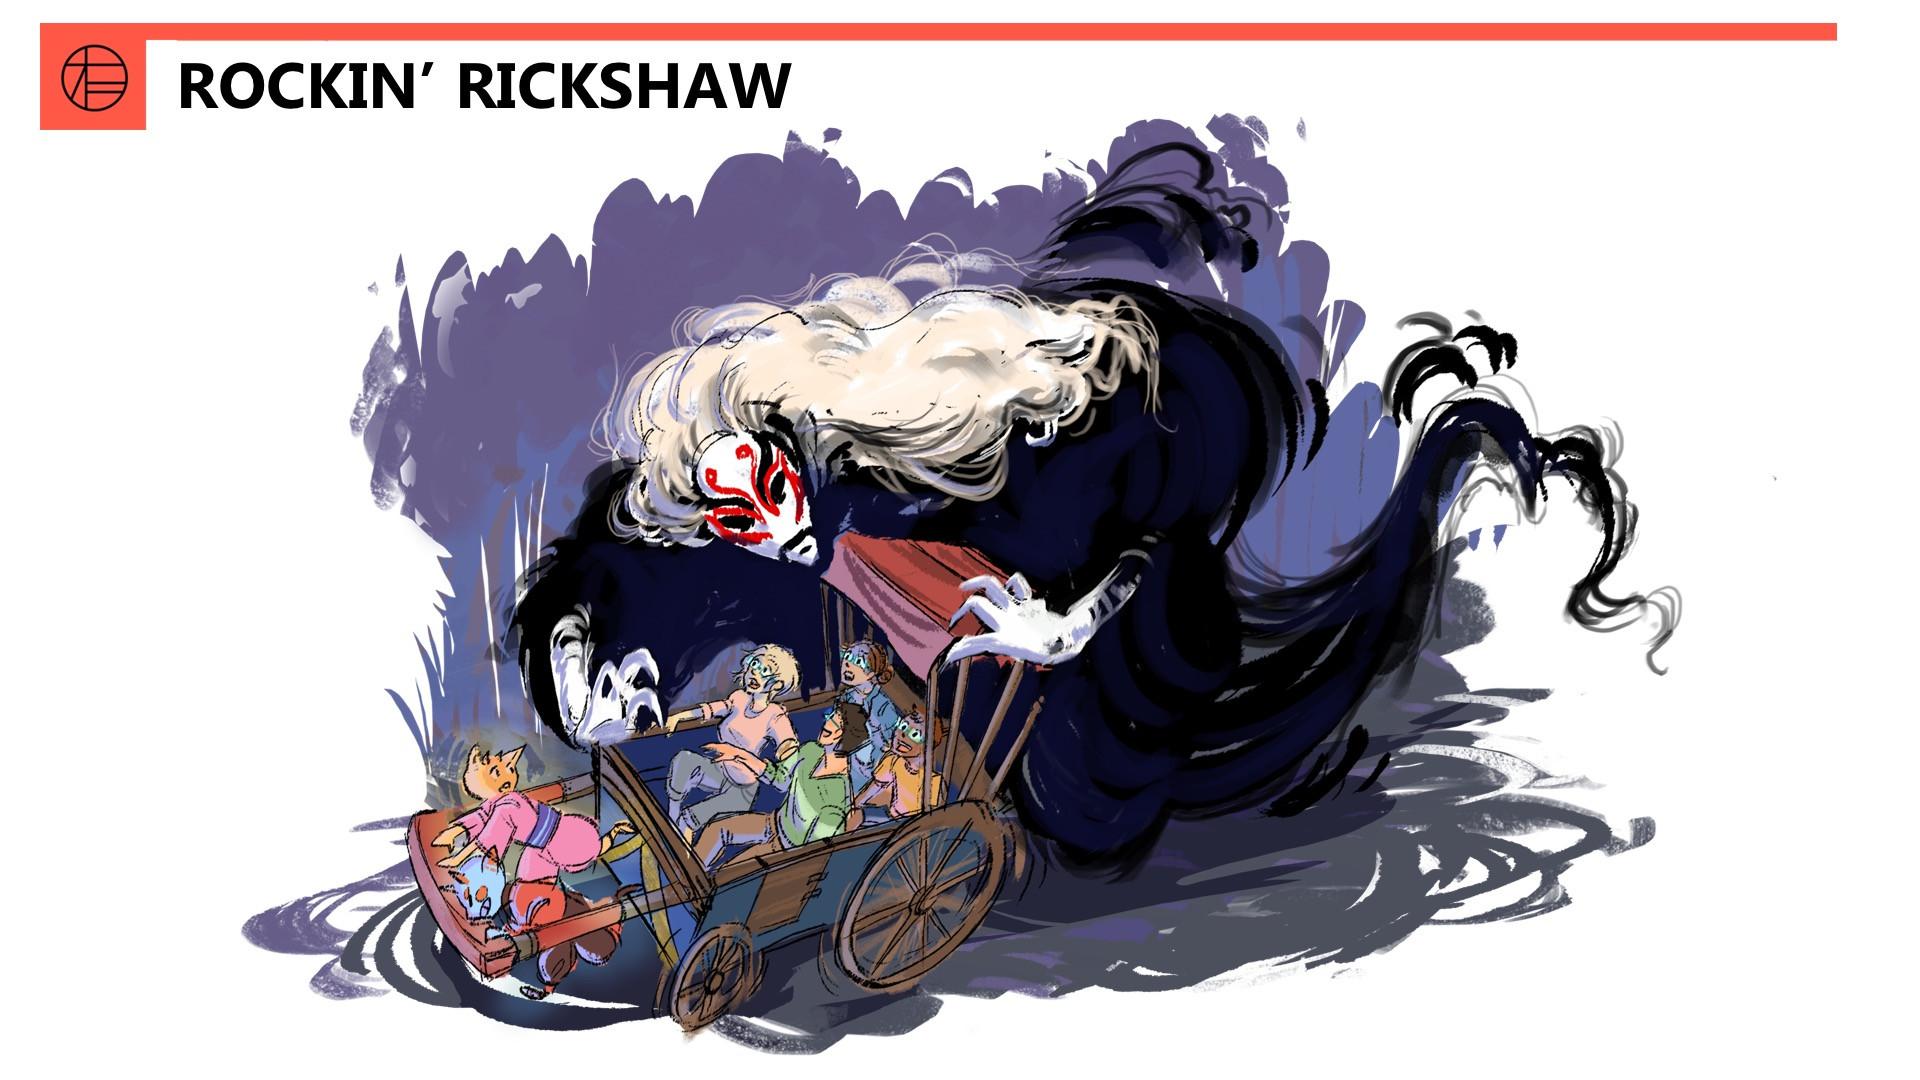 Rockin' Rickshaw